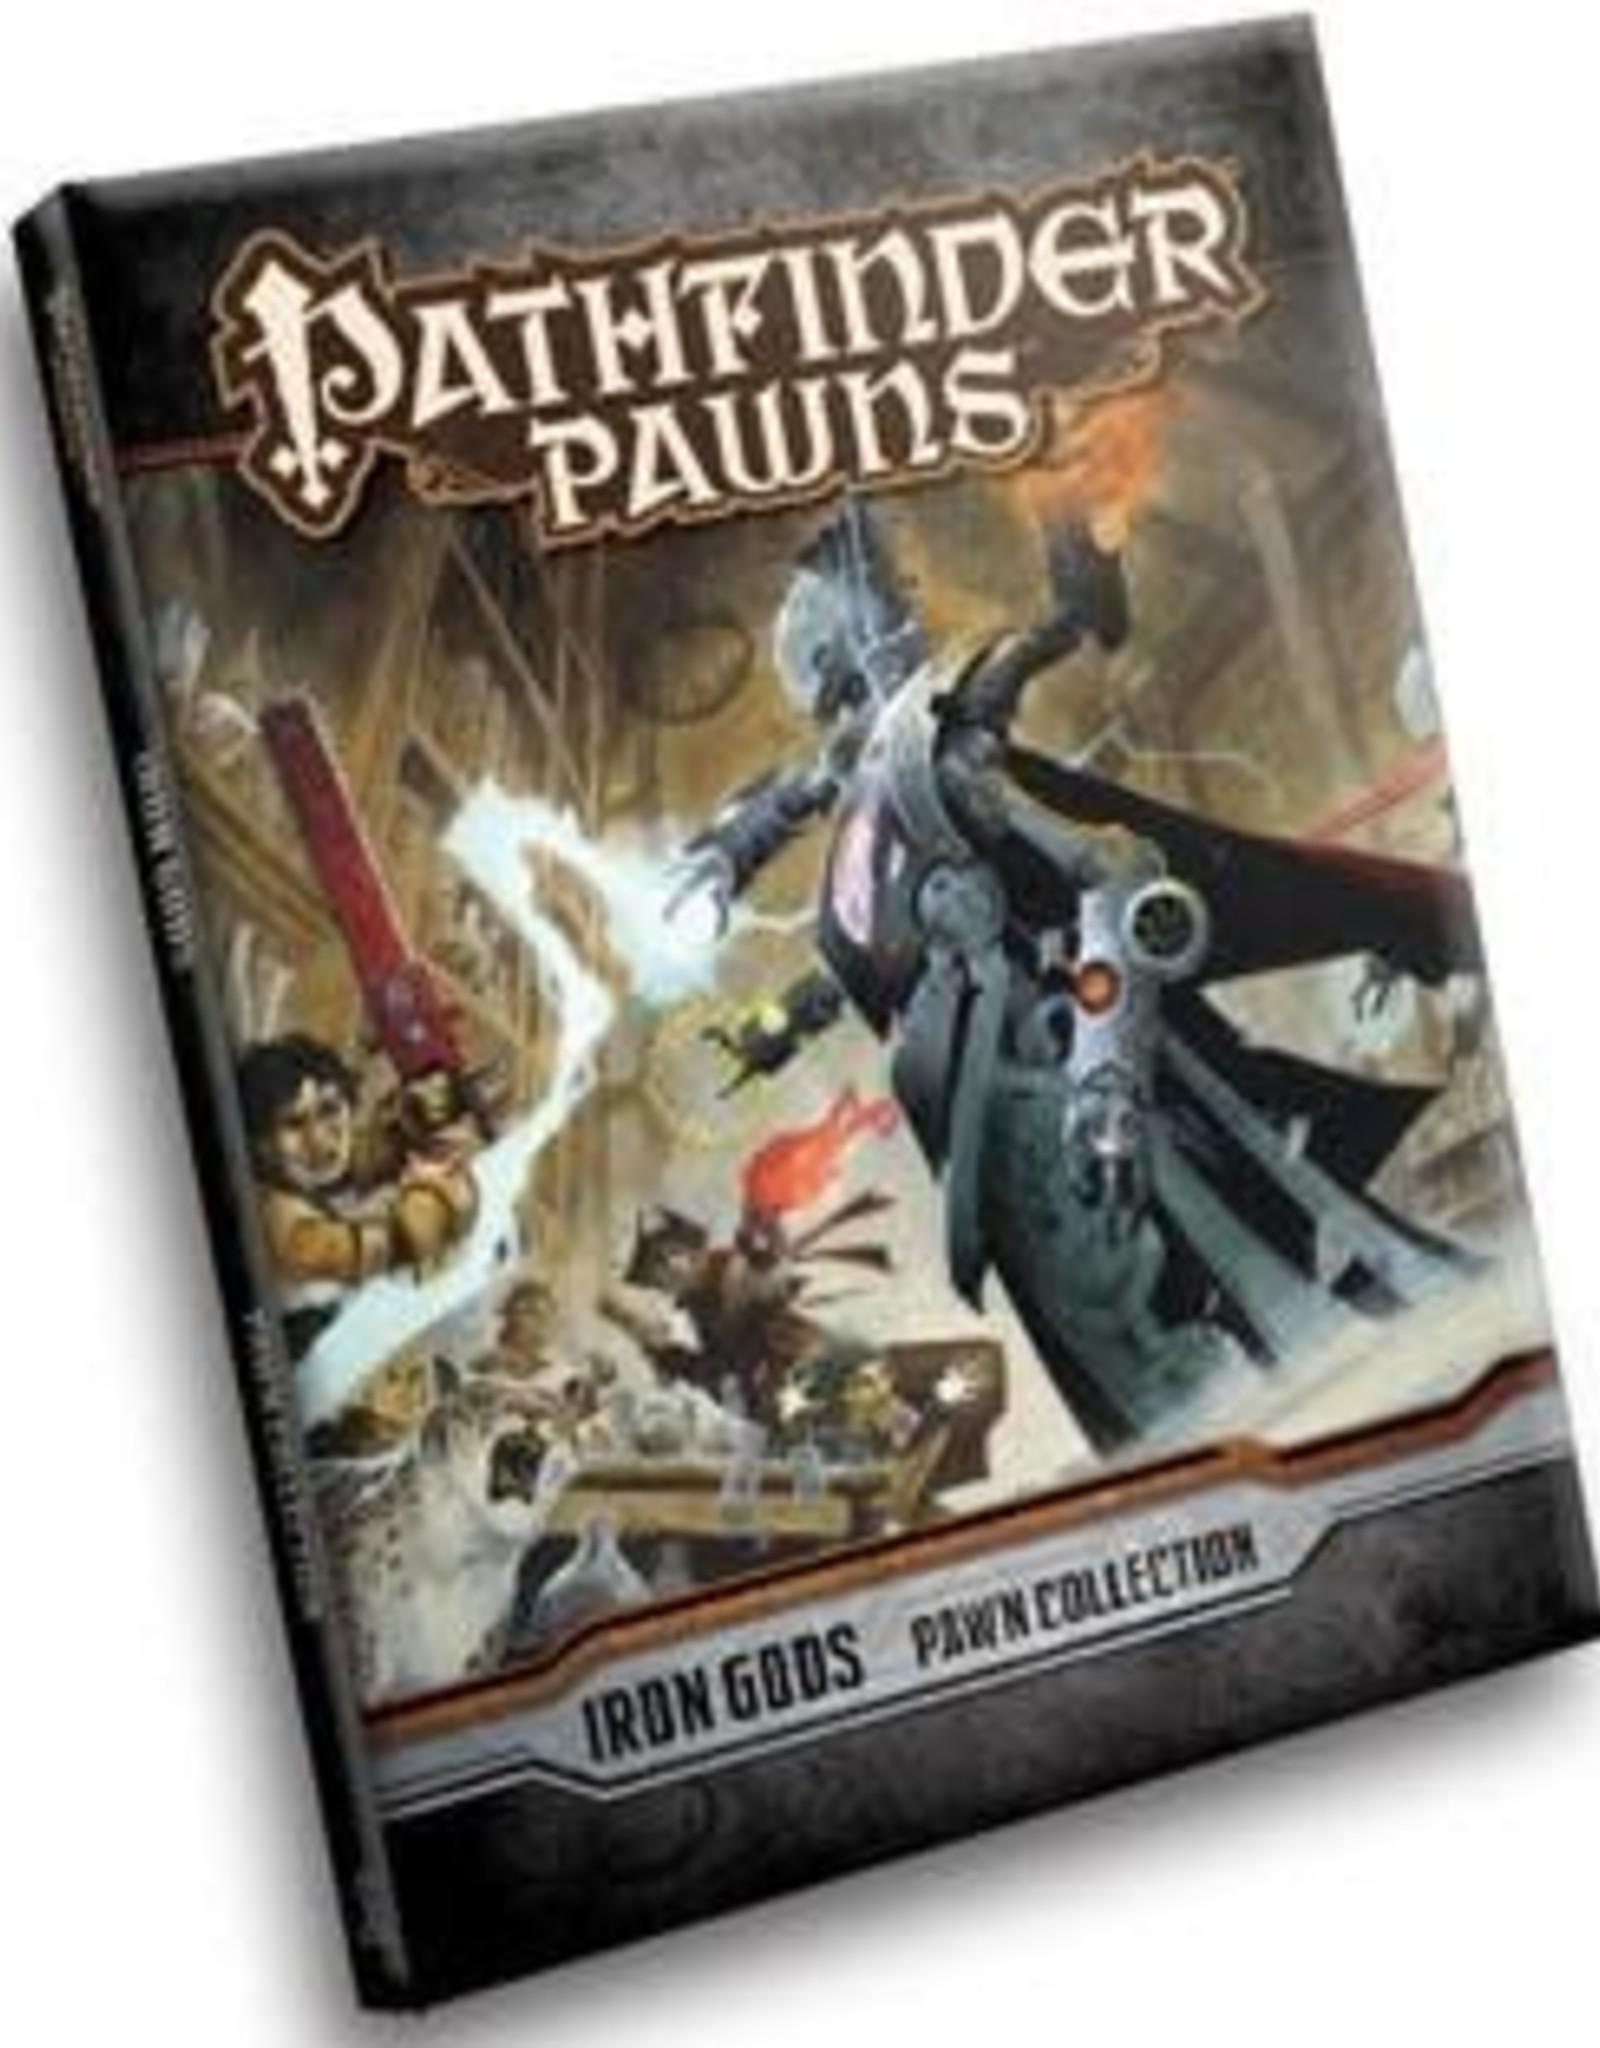 Pathfinder Iron Gods Pawn Collection